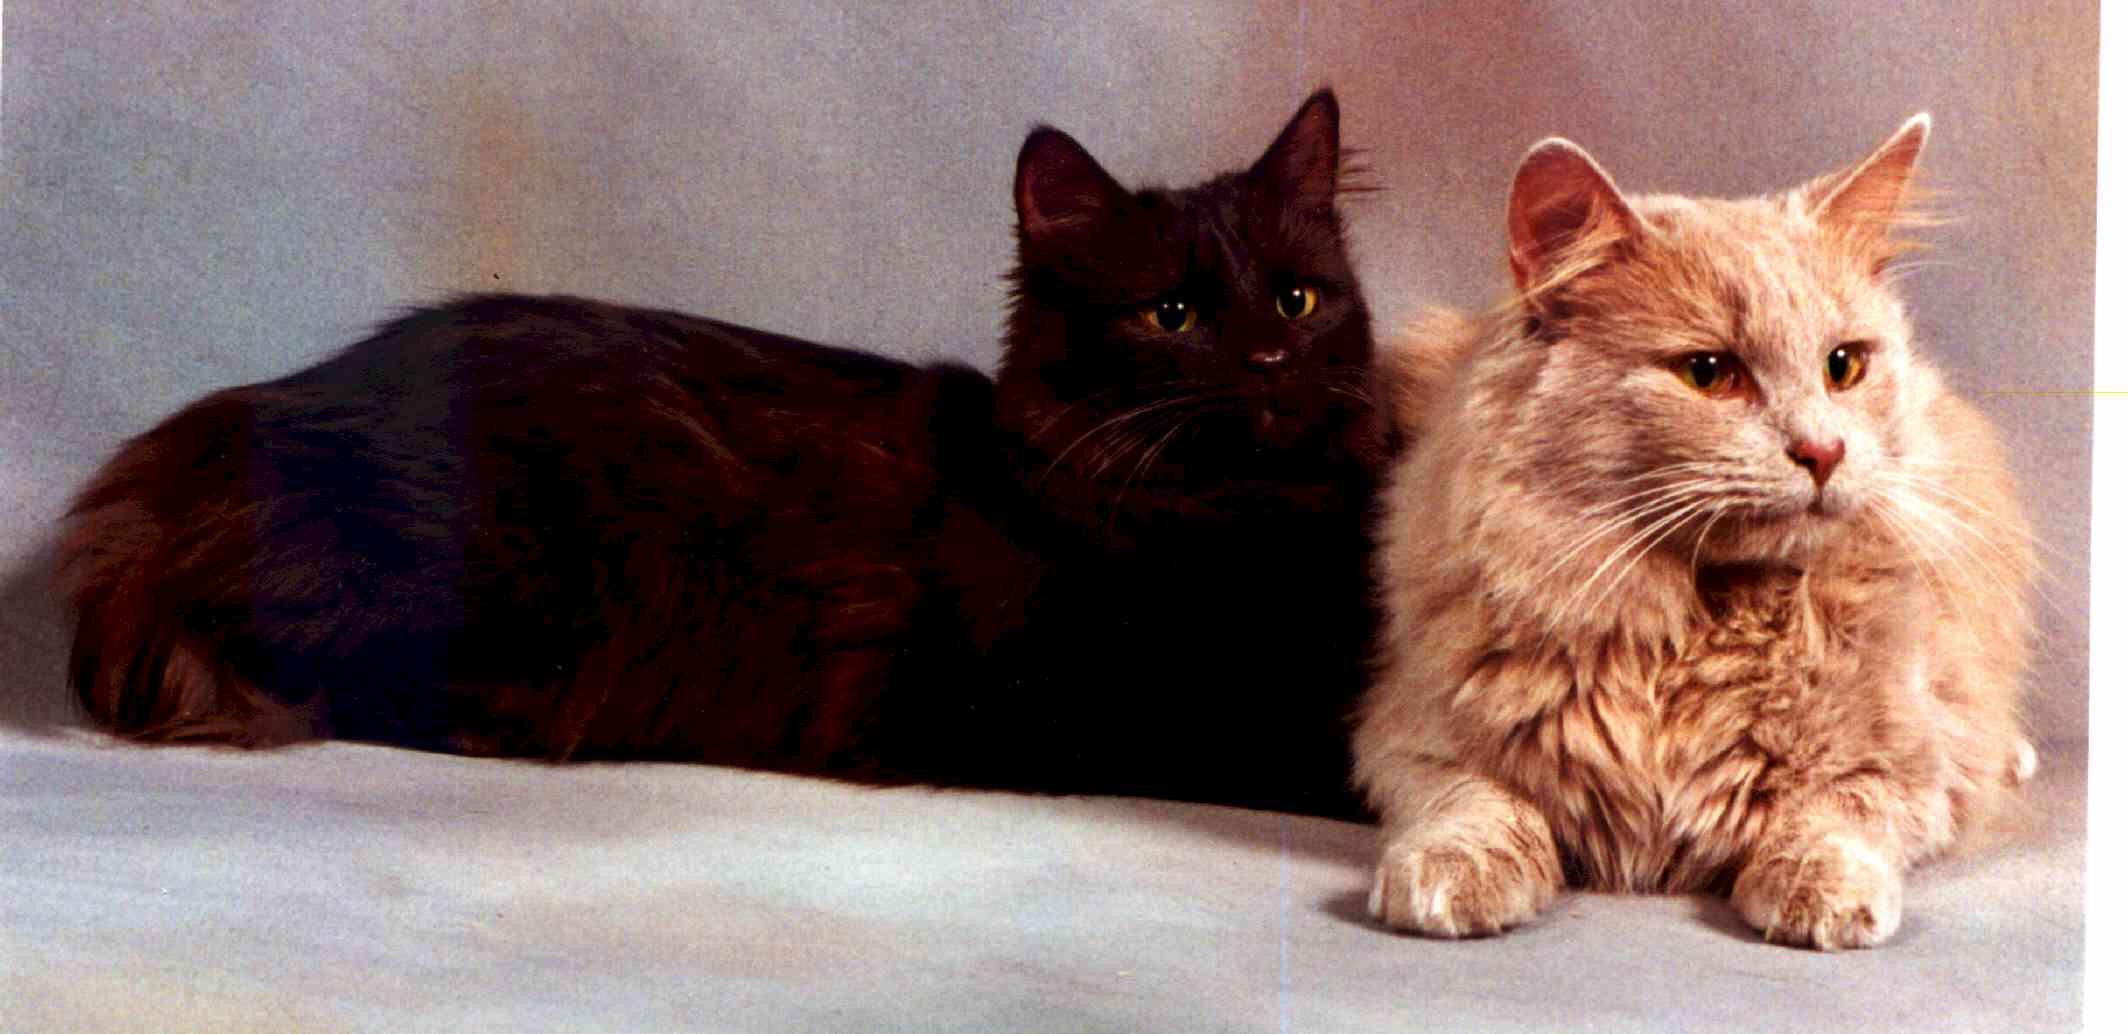 http://www.breeds.traditionalcats.com/BreedInfo/FAQTfny/image5.jpg